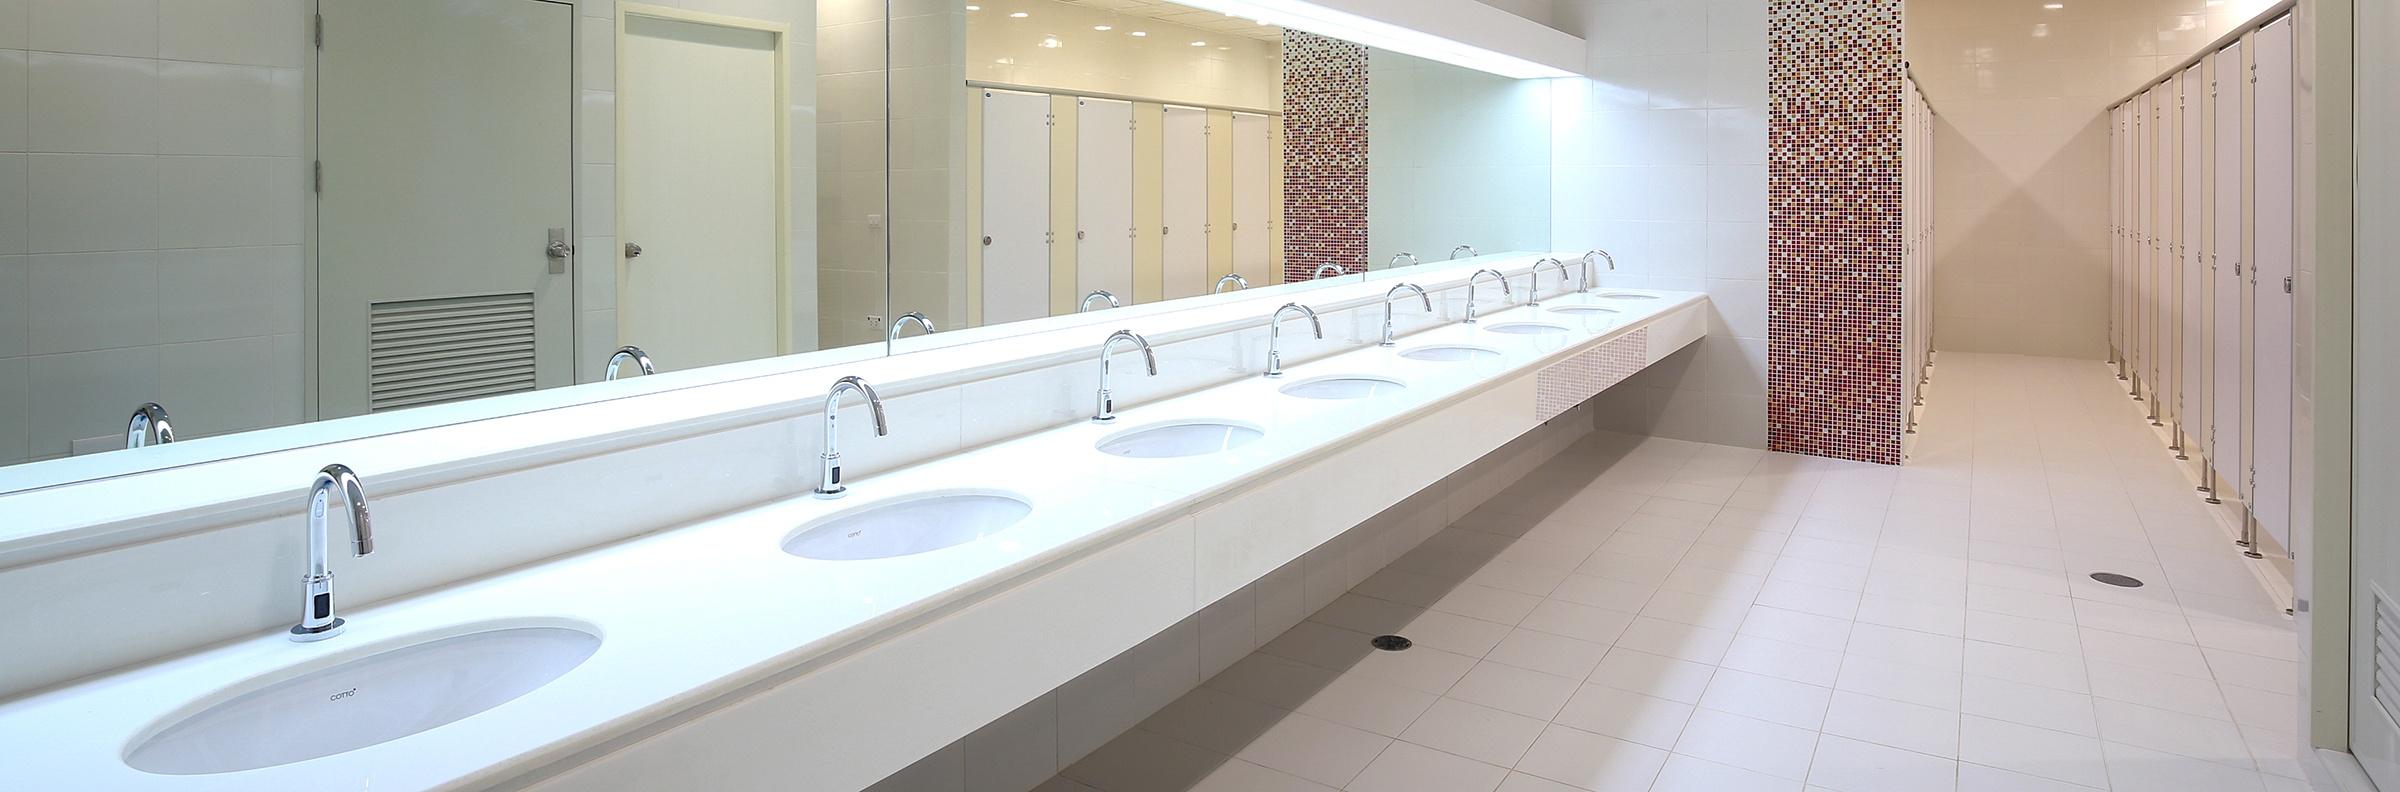 restroom-refresh.jpg